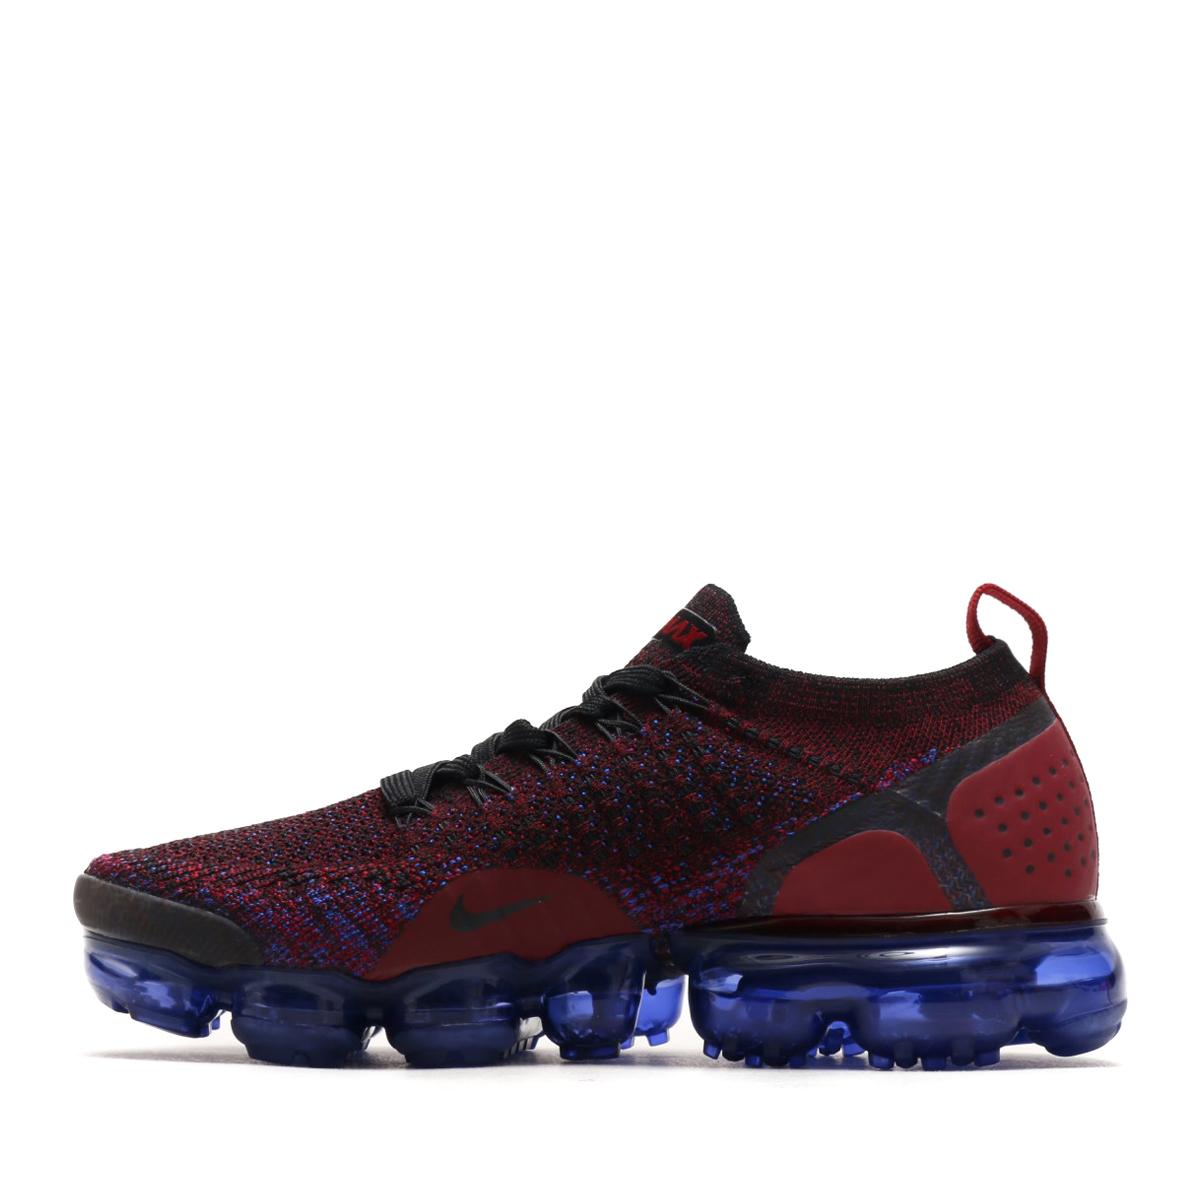 ee344bd0b08 NIKE WMNS AIR VAPORMAX FLYKNIT 2 (Nike women air vapor max fried food knit 2)  (BLACK BLACK-TEAM RED-RACER BLUE) 18SU-S